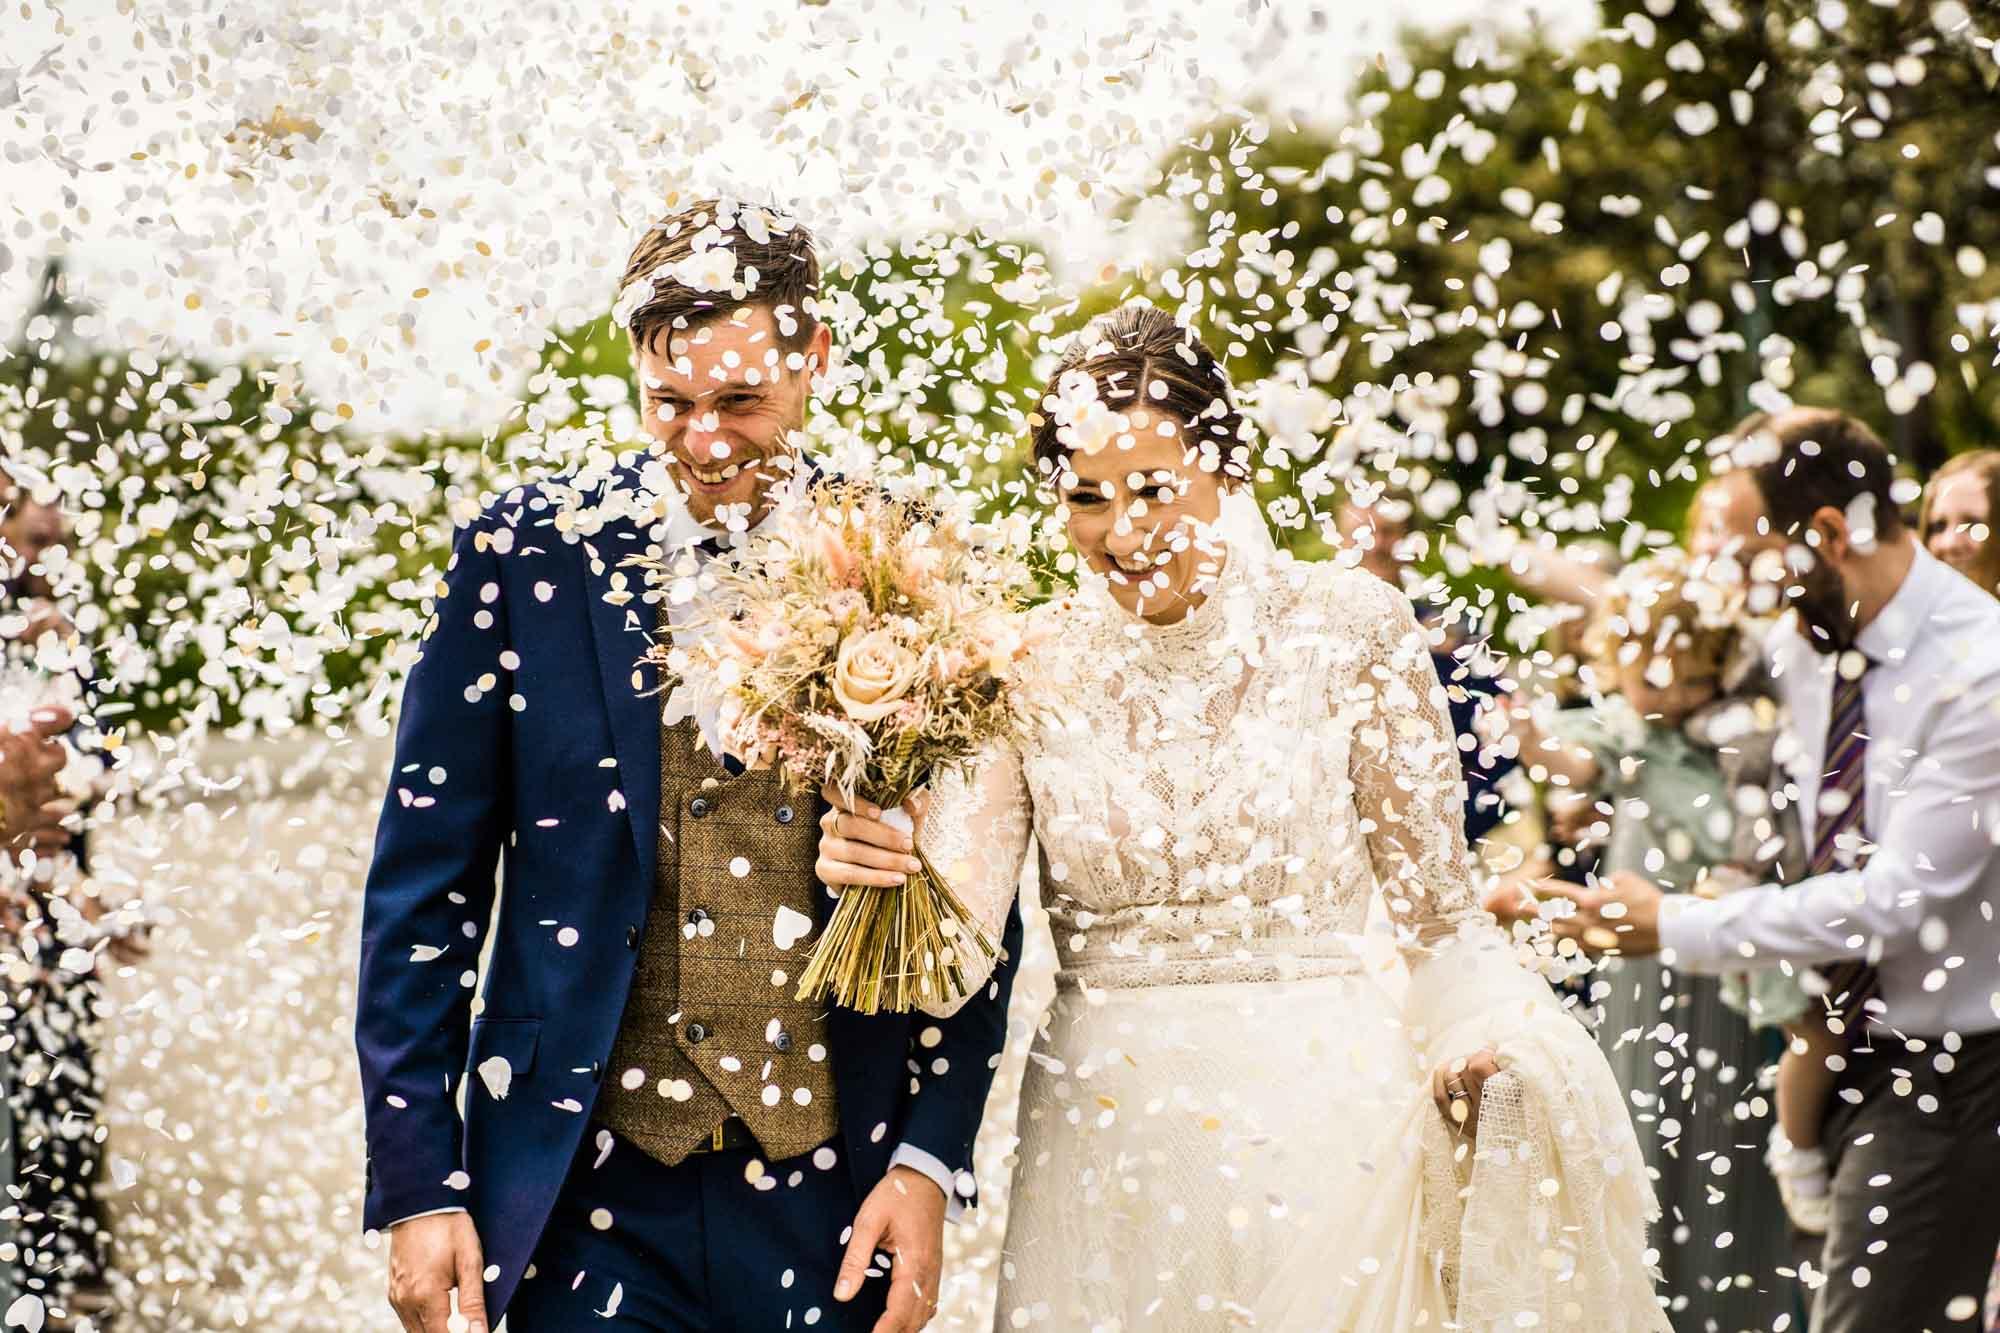 Wedding Photographer Dunham Massey Village Hall